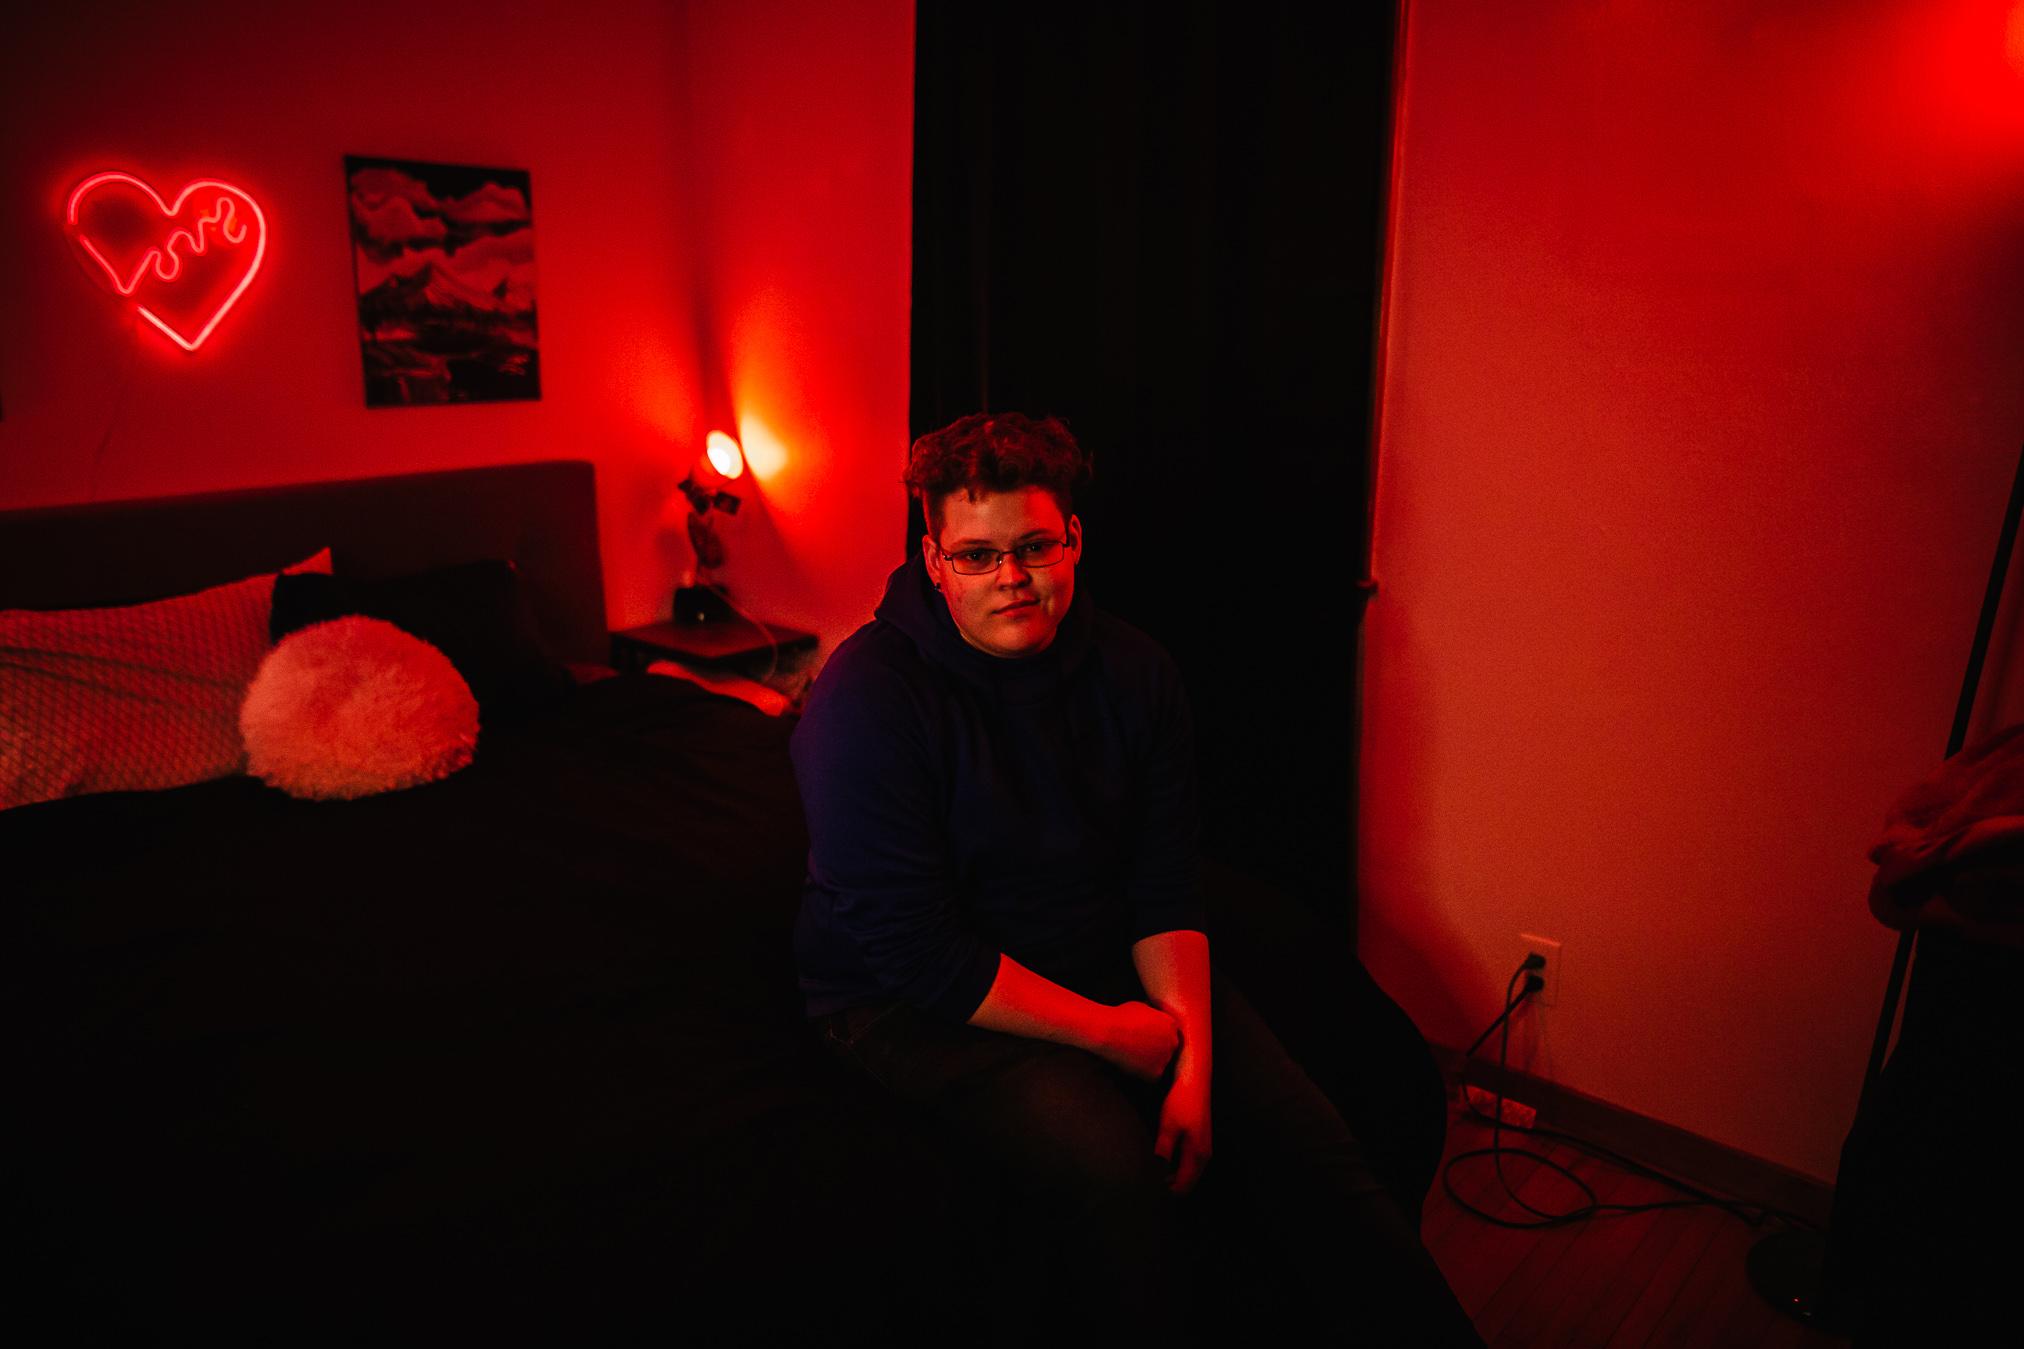 RED LIGHT BOUDOIR BOUDOIR BY LEXY CEDAR FALLS IOWA-1.jpg